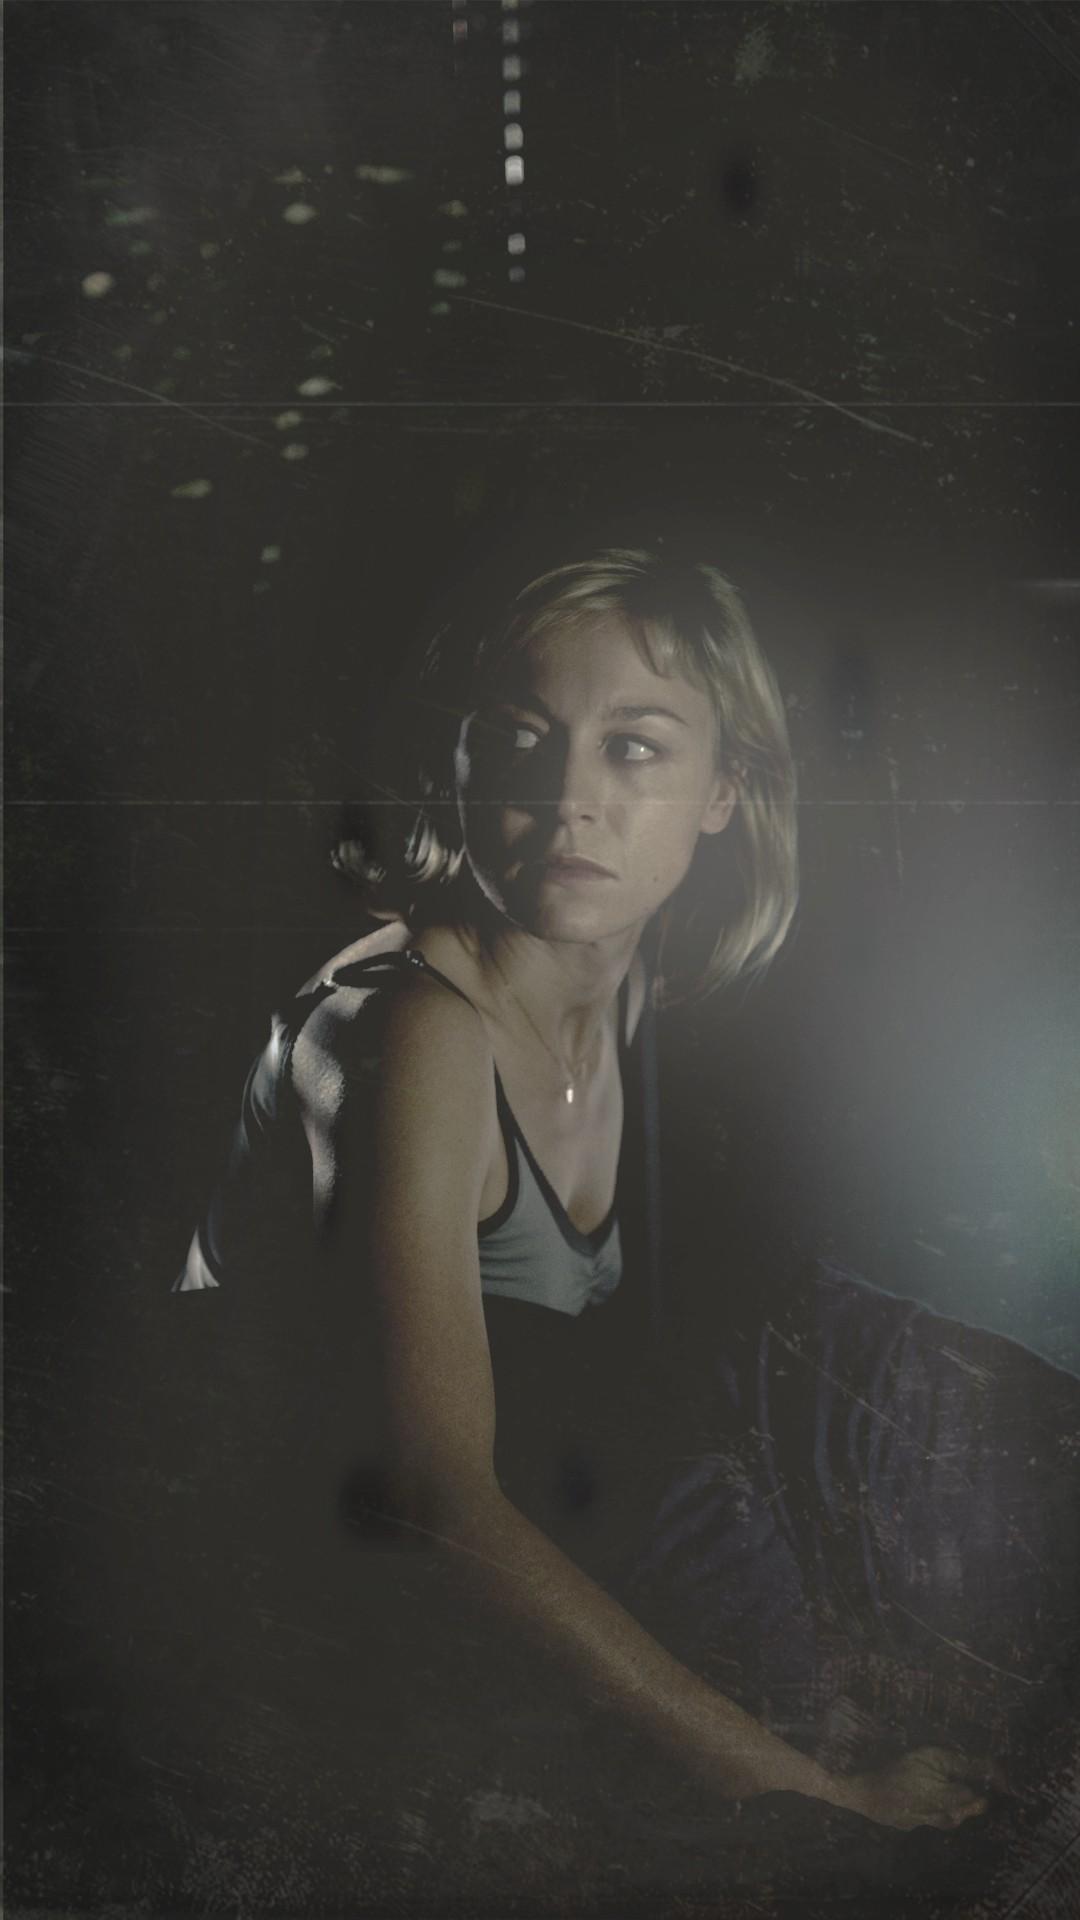 кадры из фильма Синистер